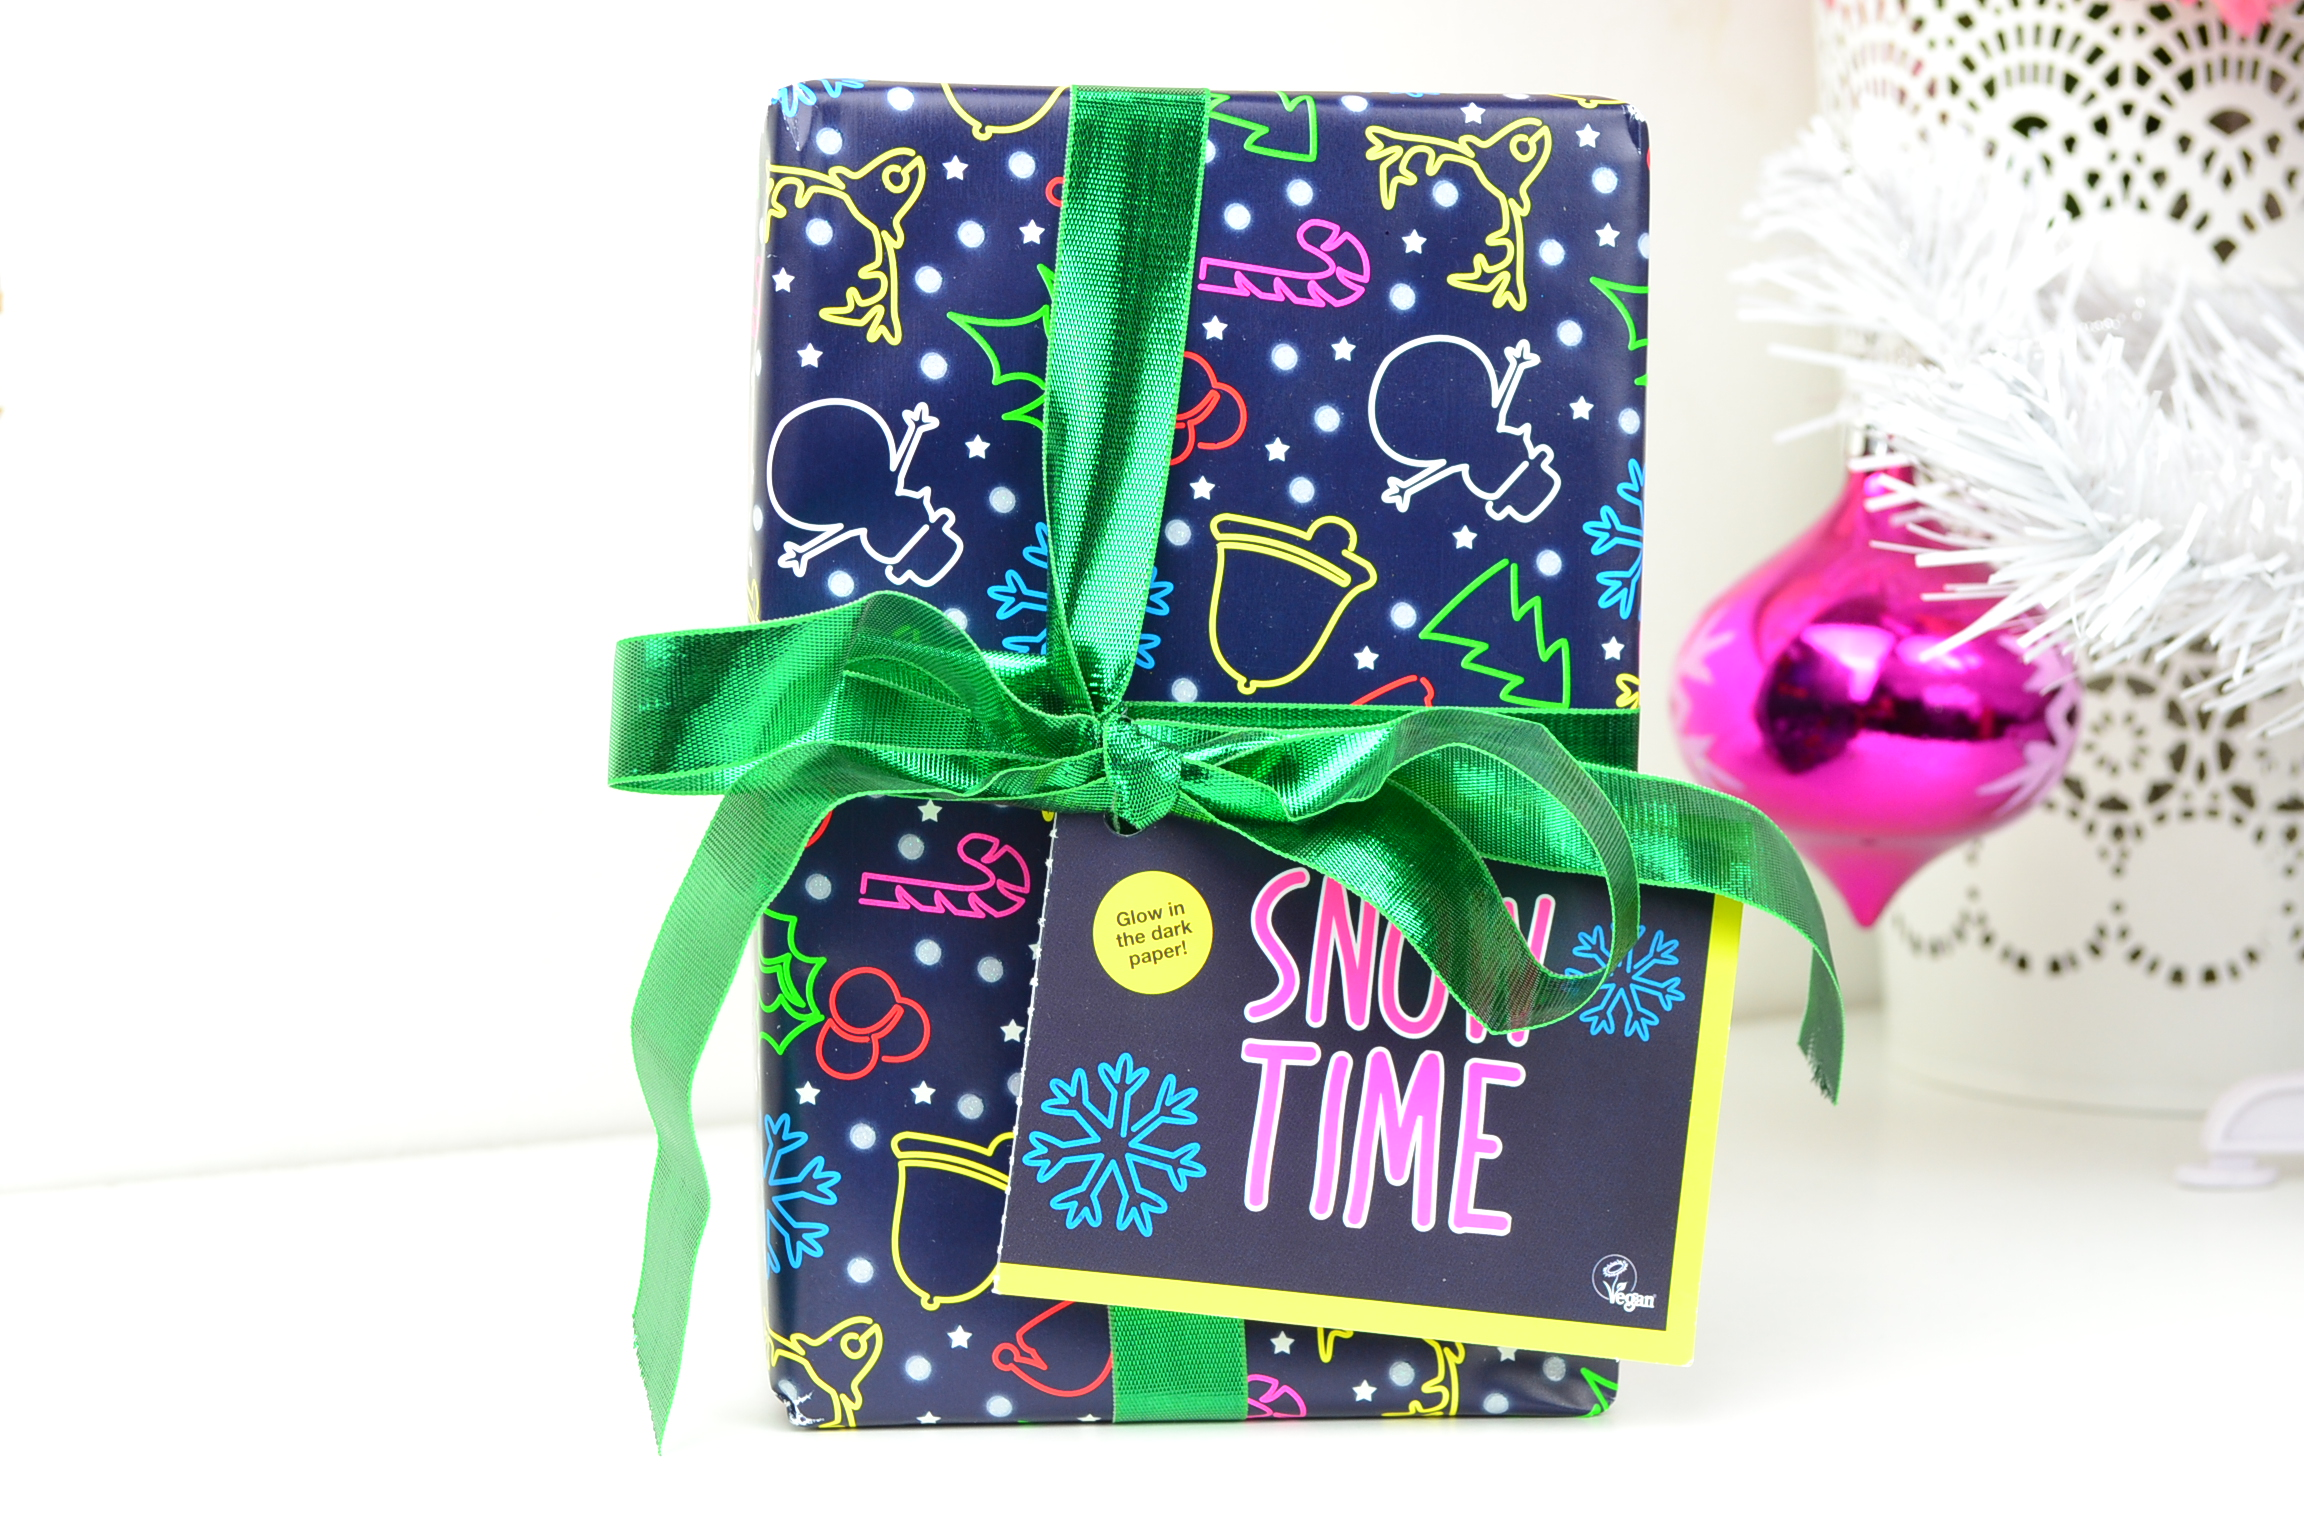 Lush - Snow Time gift Set